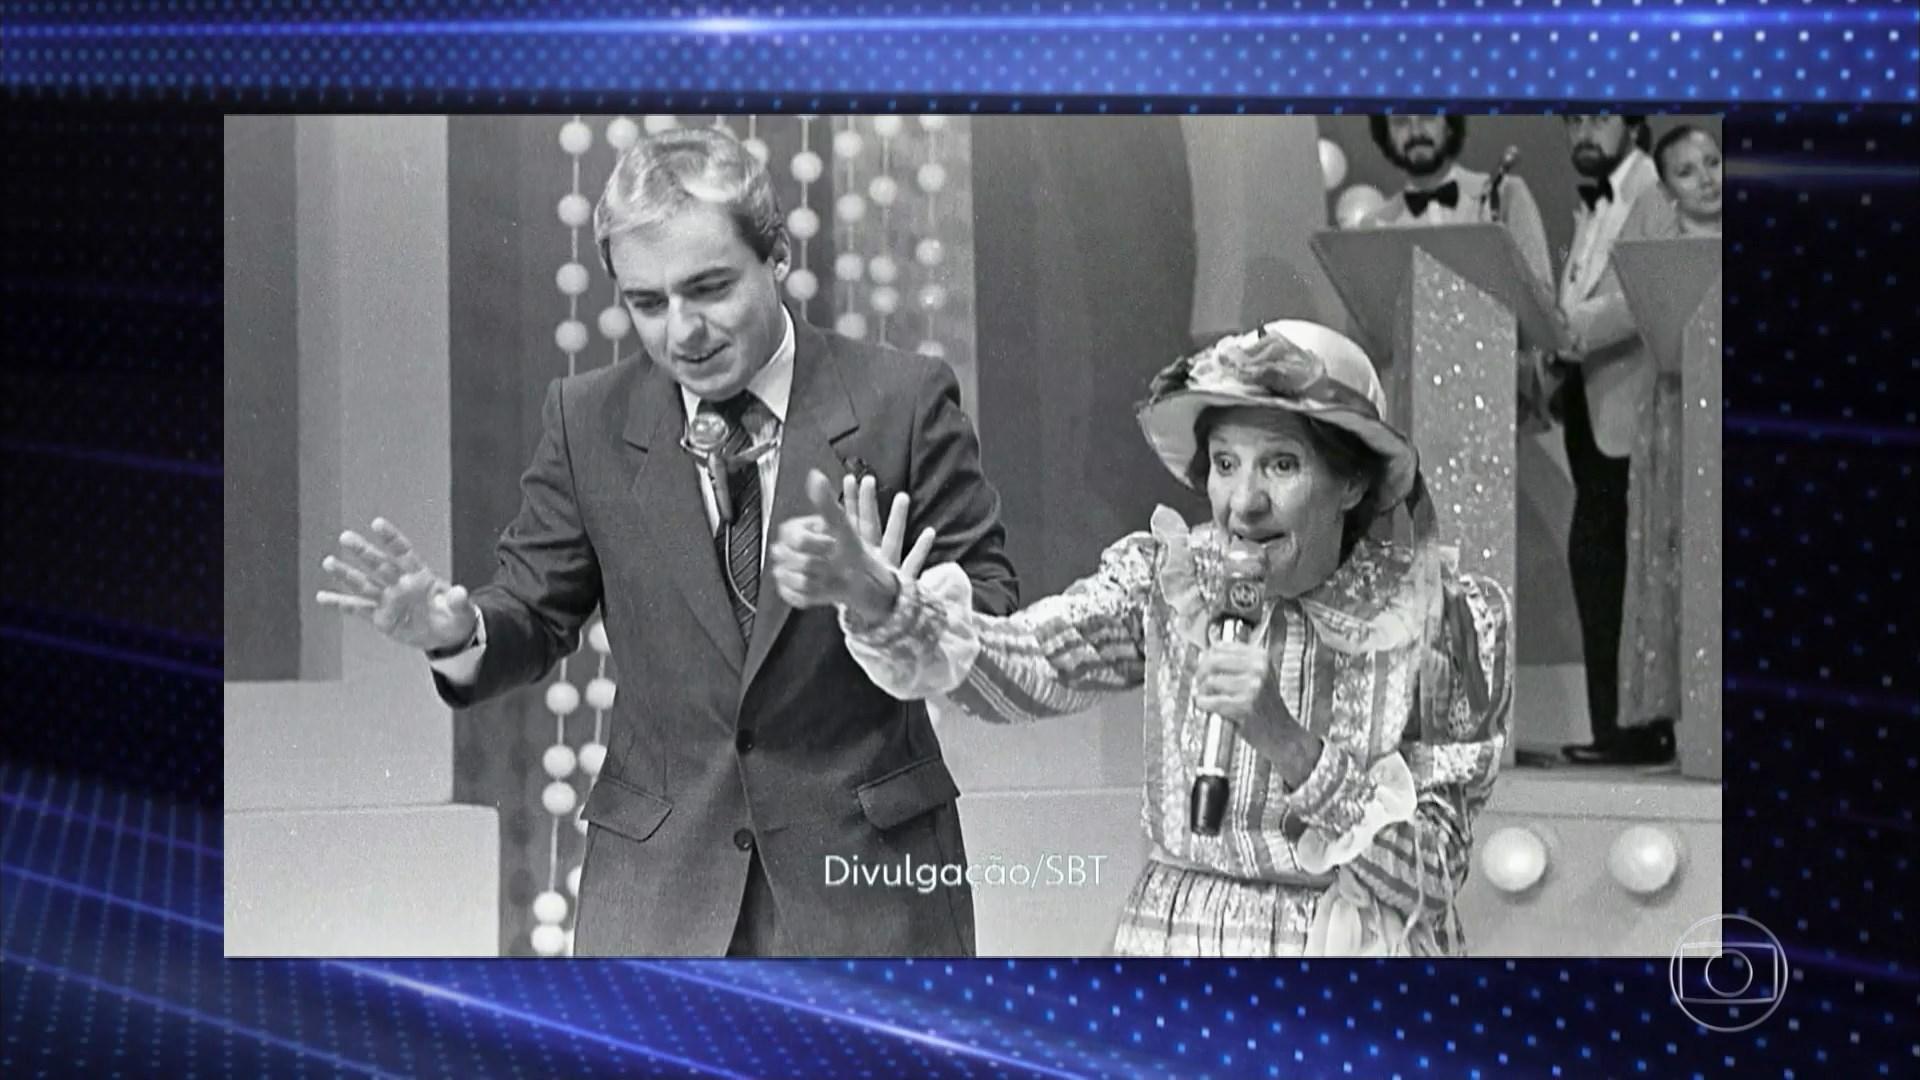 Gugu Liberato recebe homenagem na TV Globo